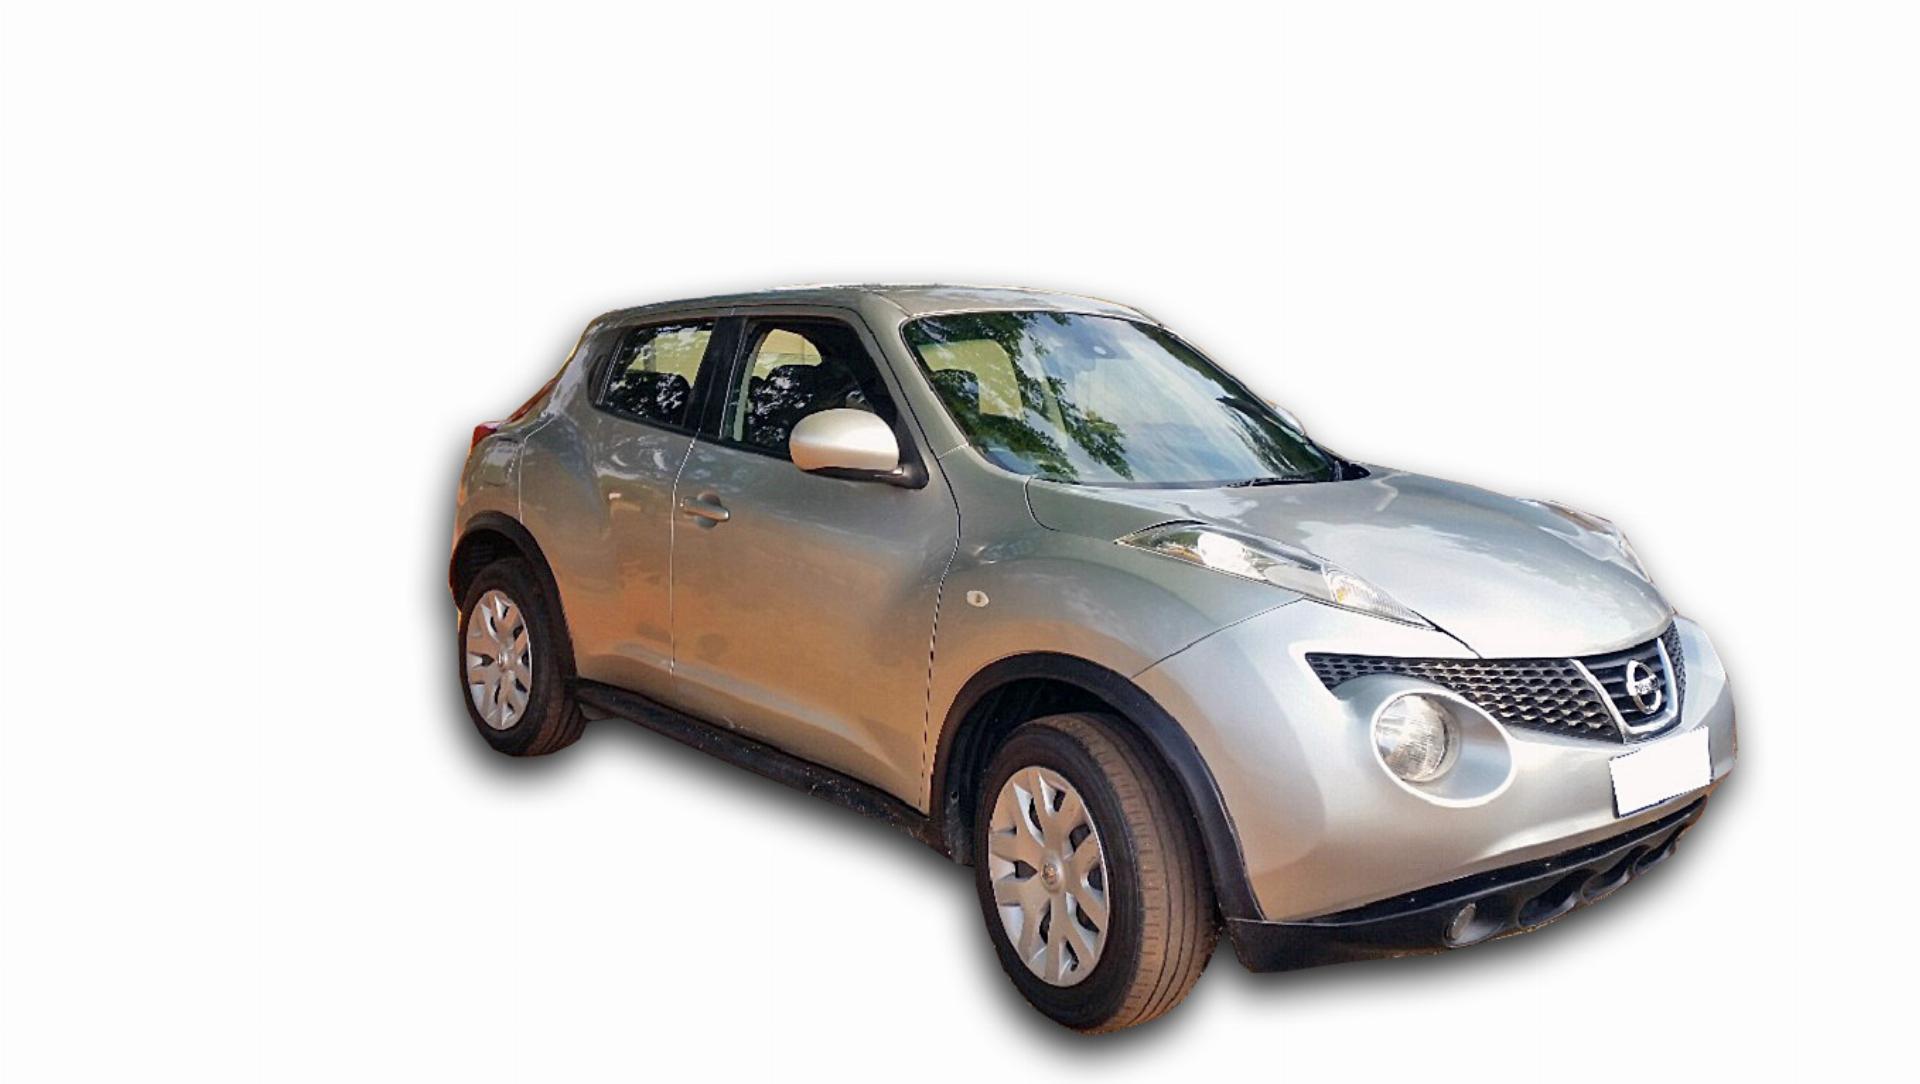 Nissan Juke Accenta 1.6 Plus